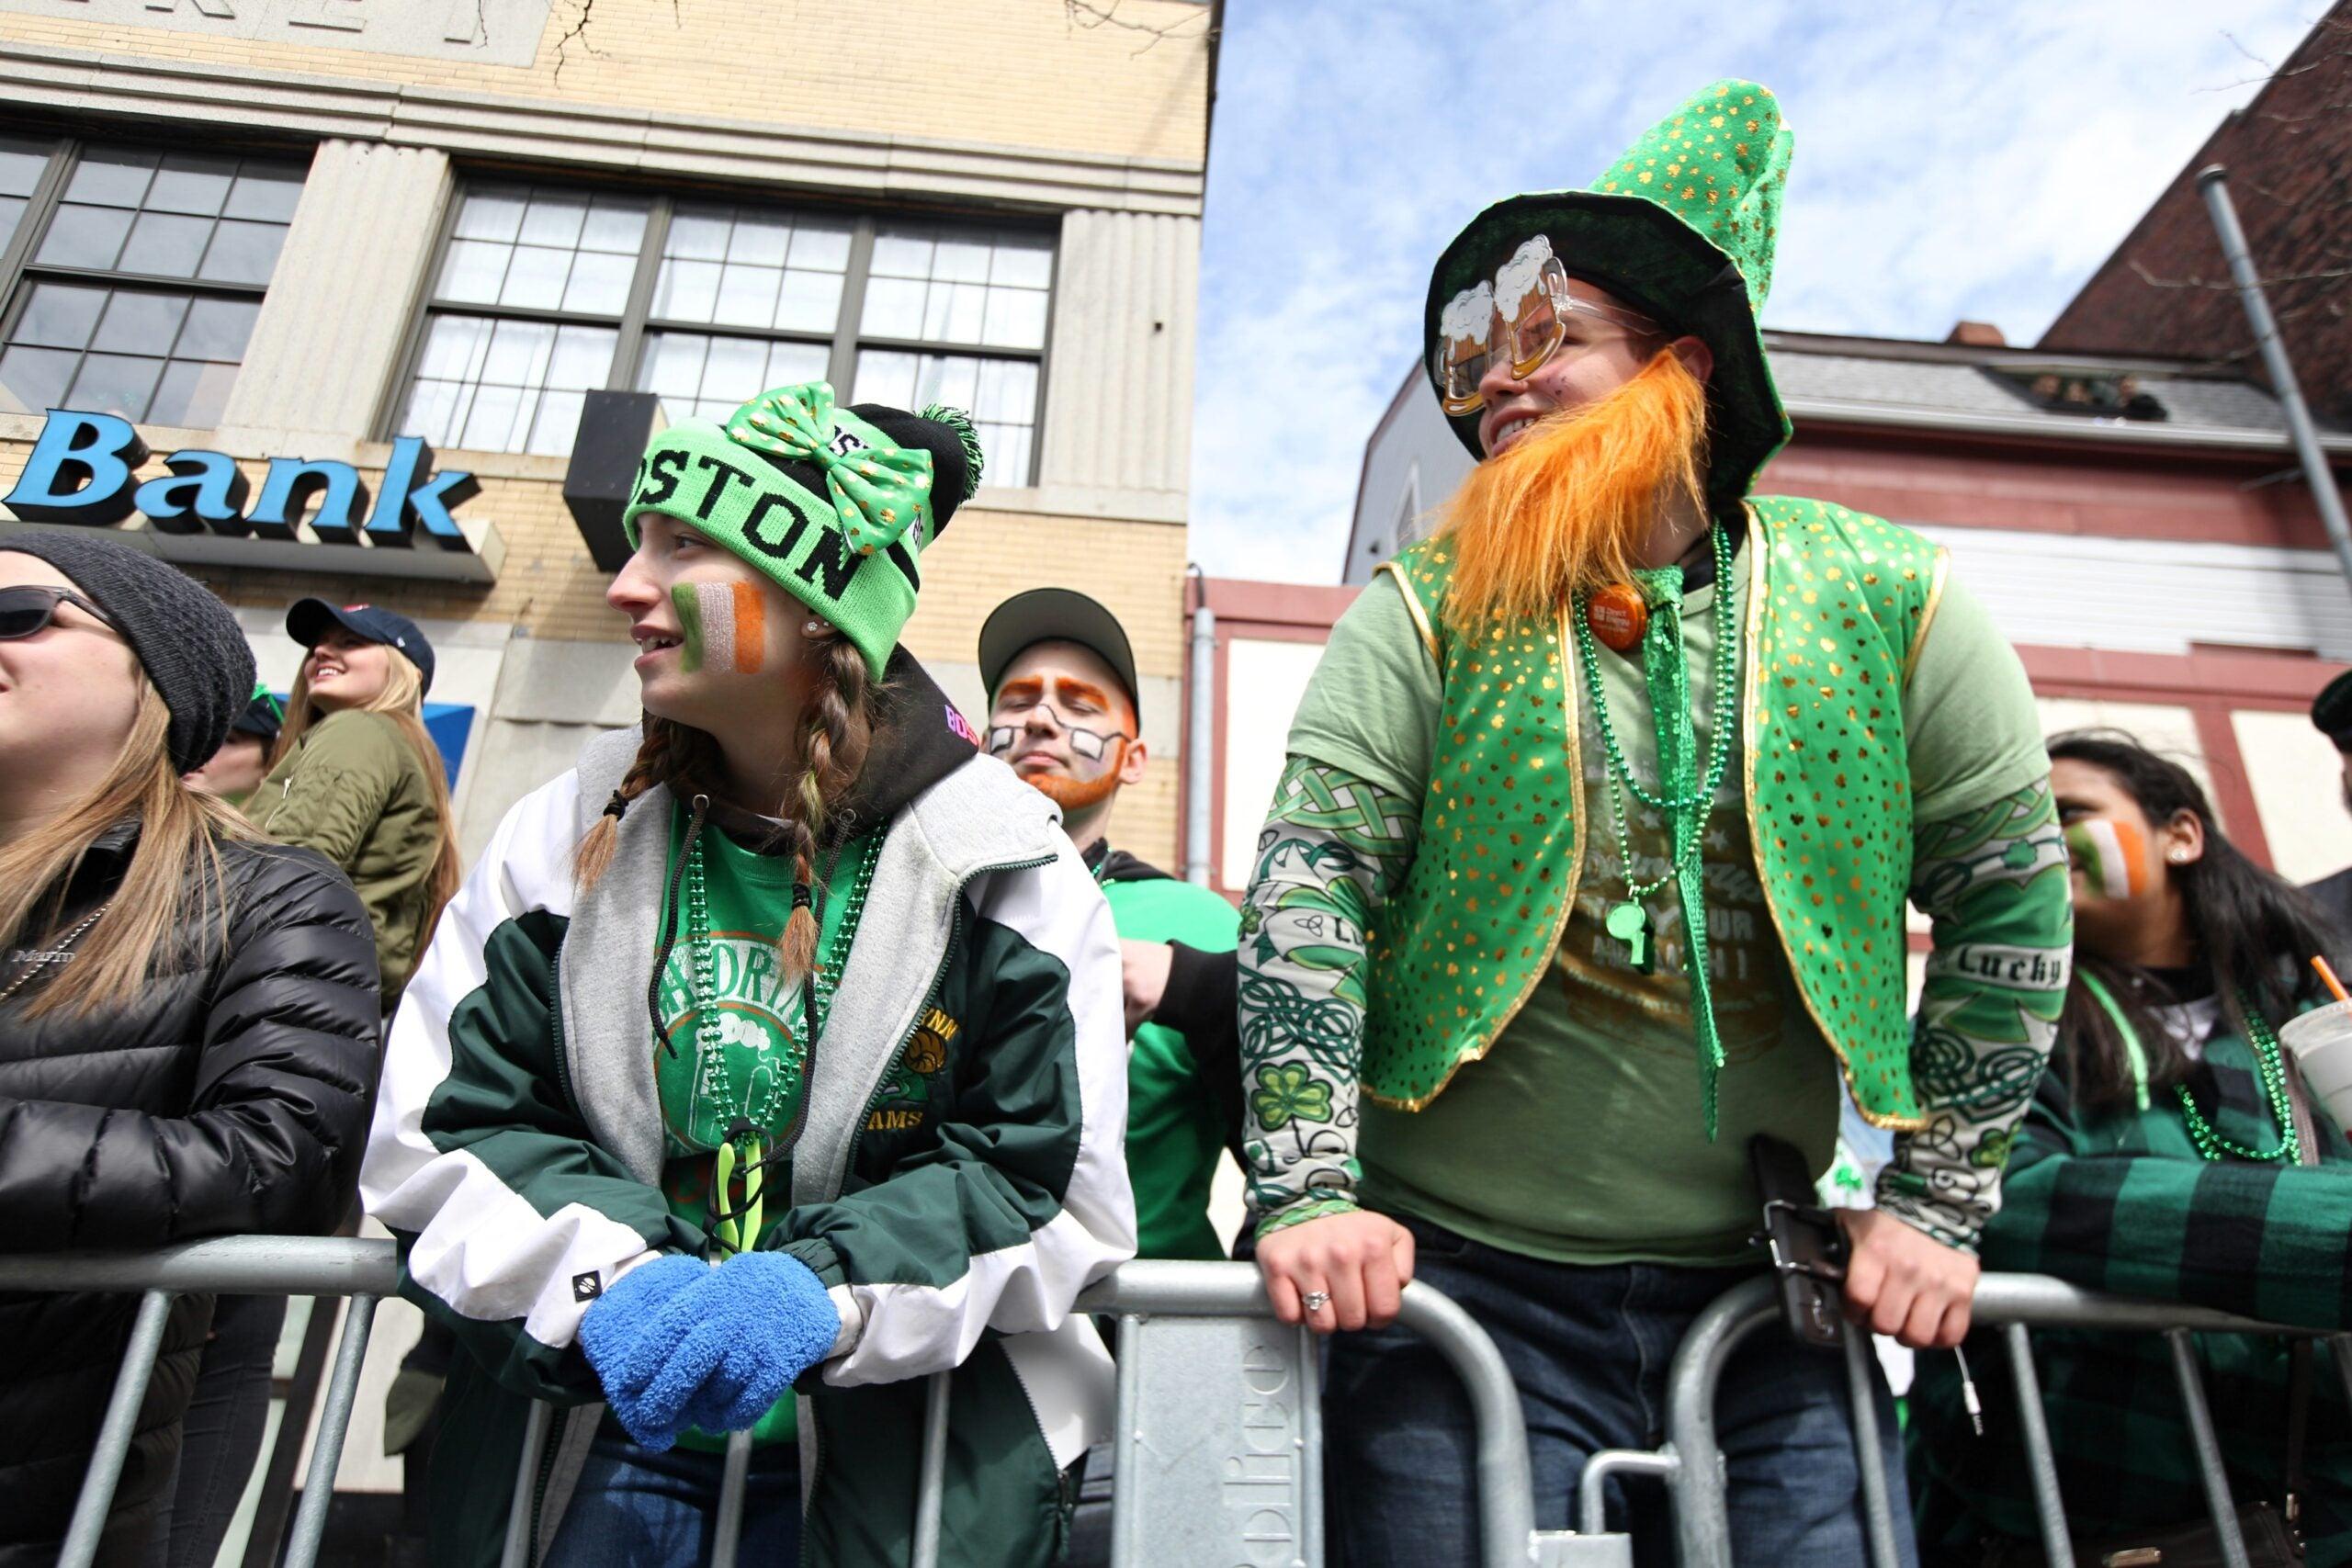 St. Patrick's Day Parade in Boston